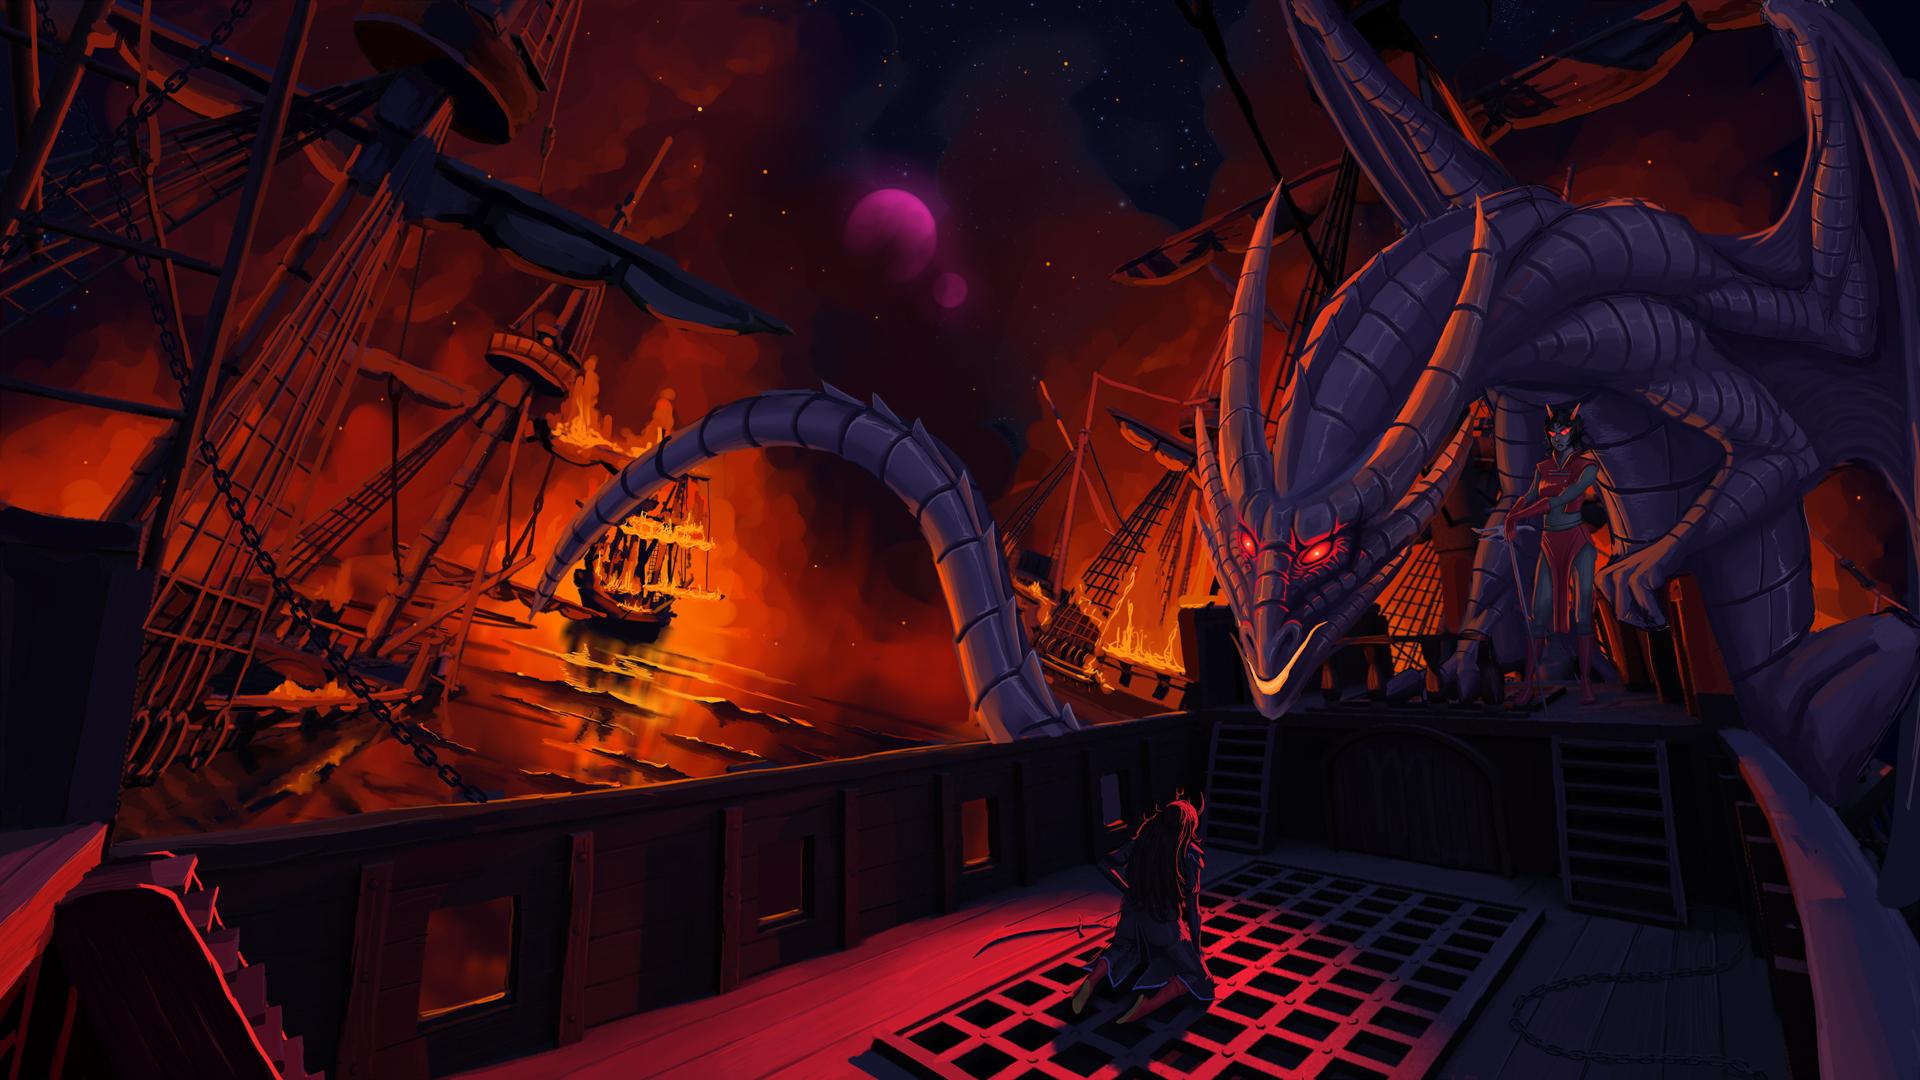 Wallpaper Digital Art Fantasy Art Dragon Sailing Ship Red Eyes